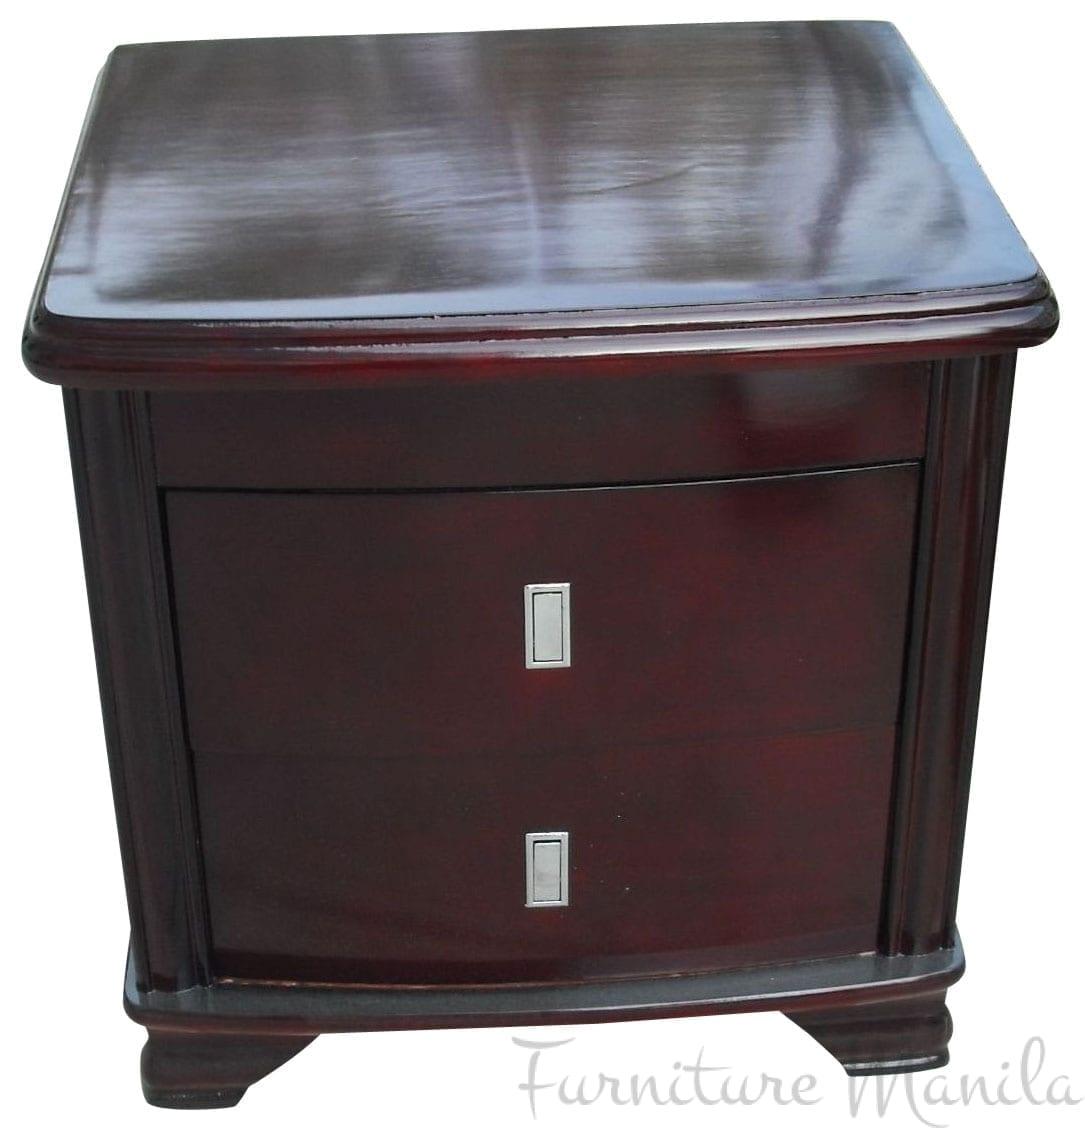 01 night table furniture manila philippines for Furniture manila